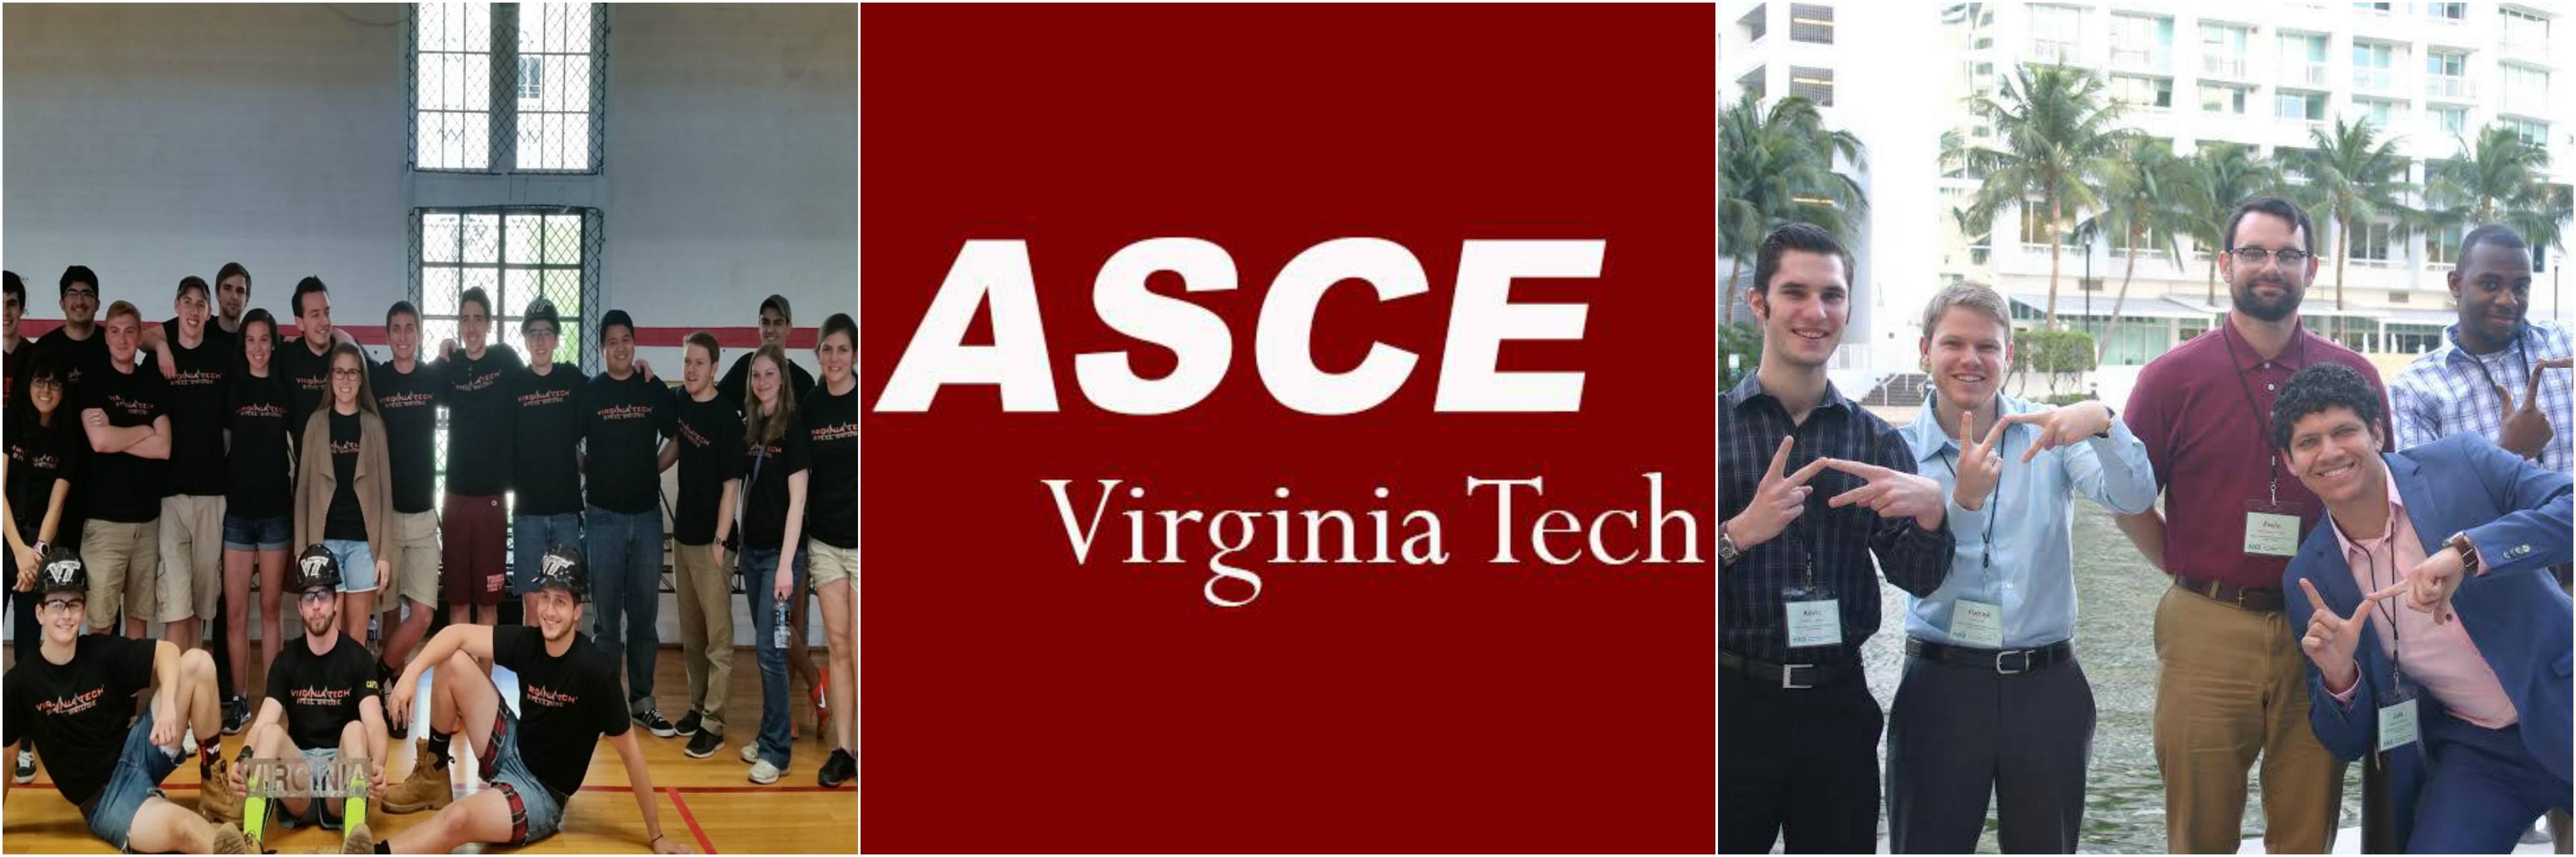 ASCE 24 2014 paper